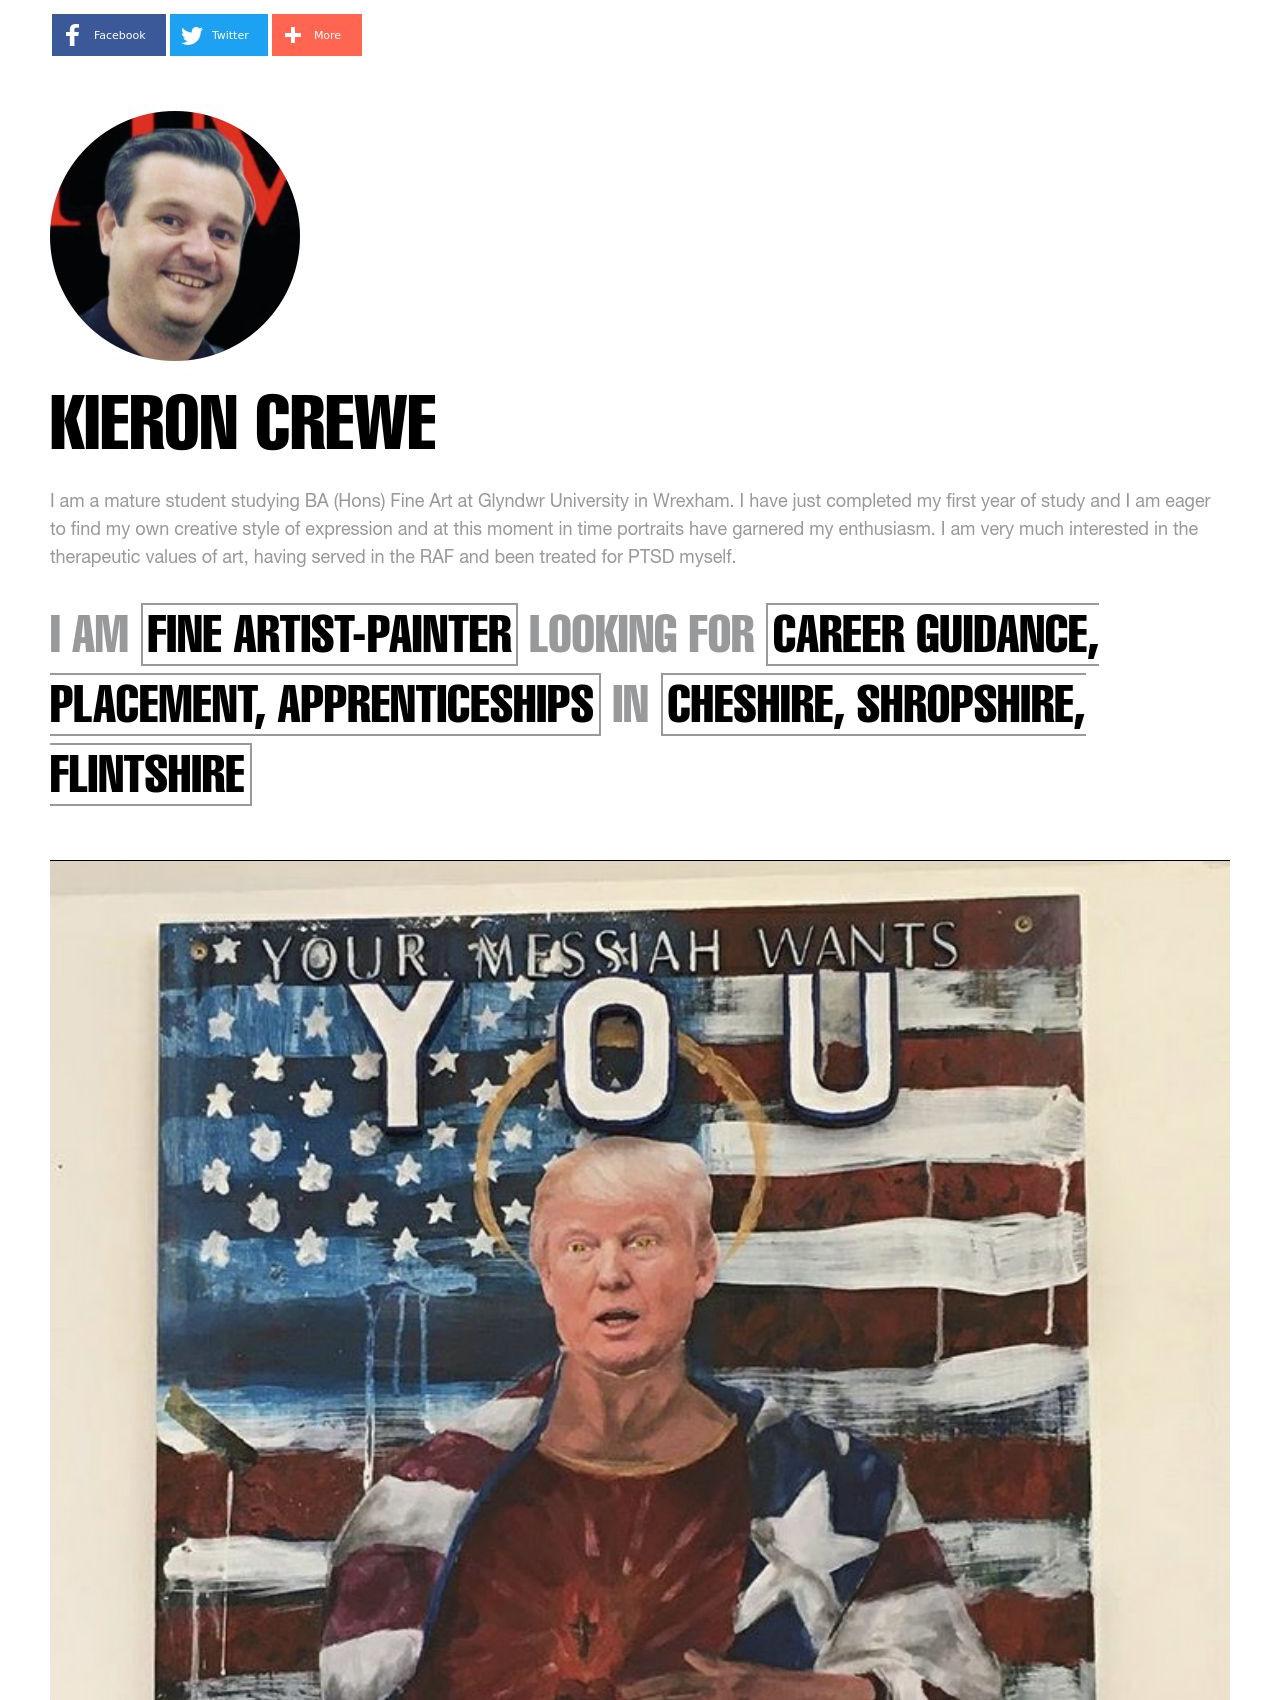 Kieron Crewe